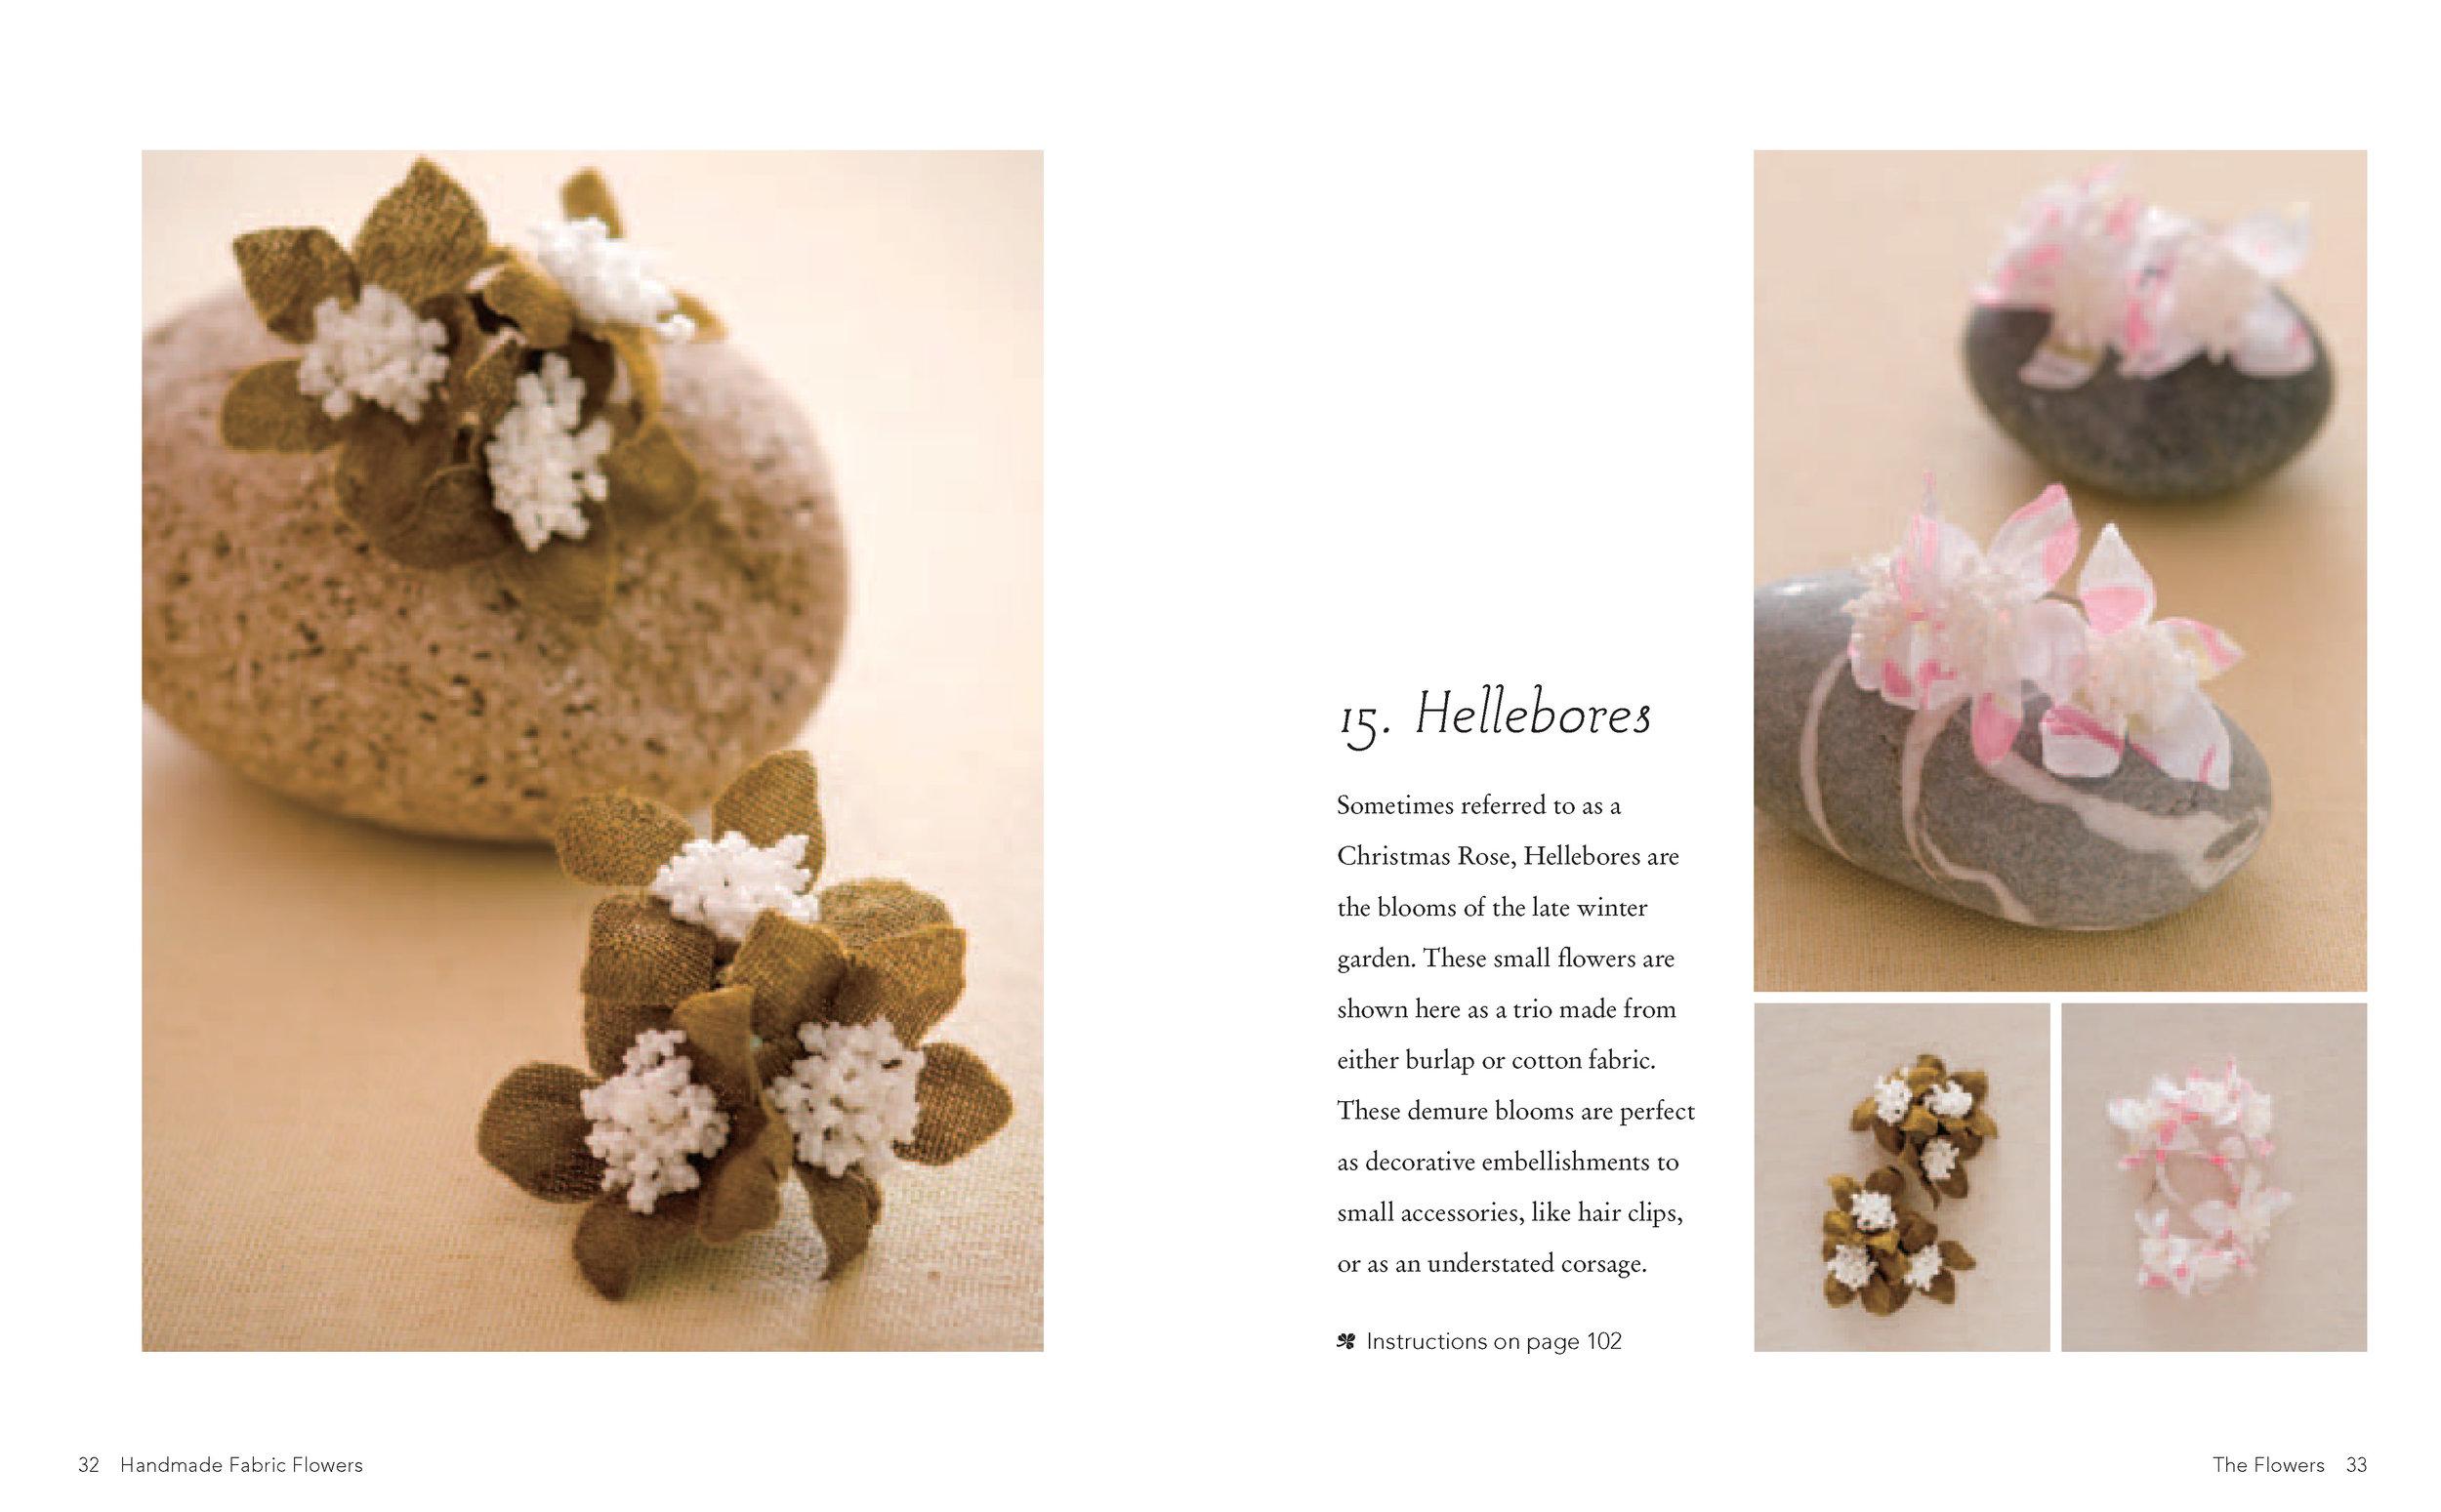 Handmade Fabric Flowers 32.33.jpg